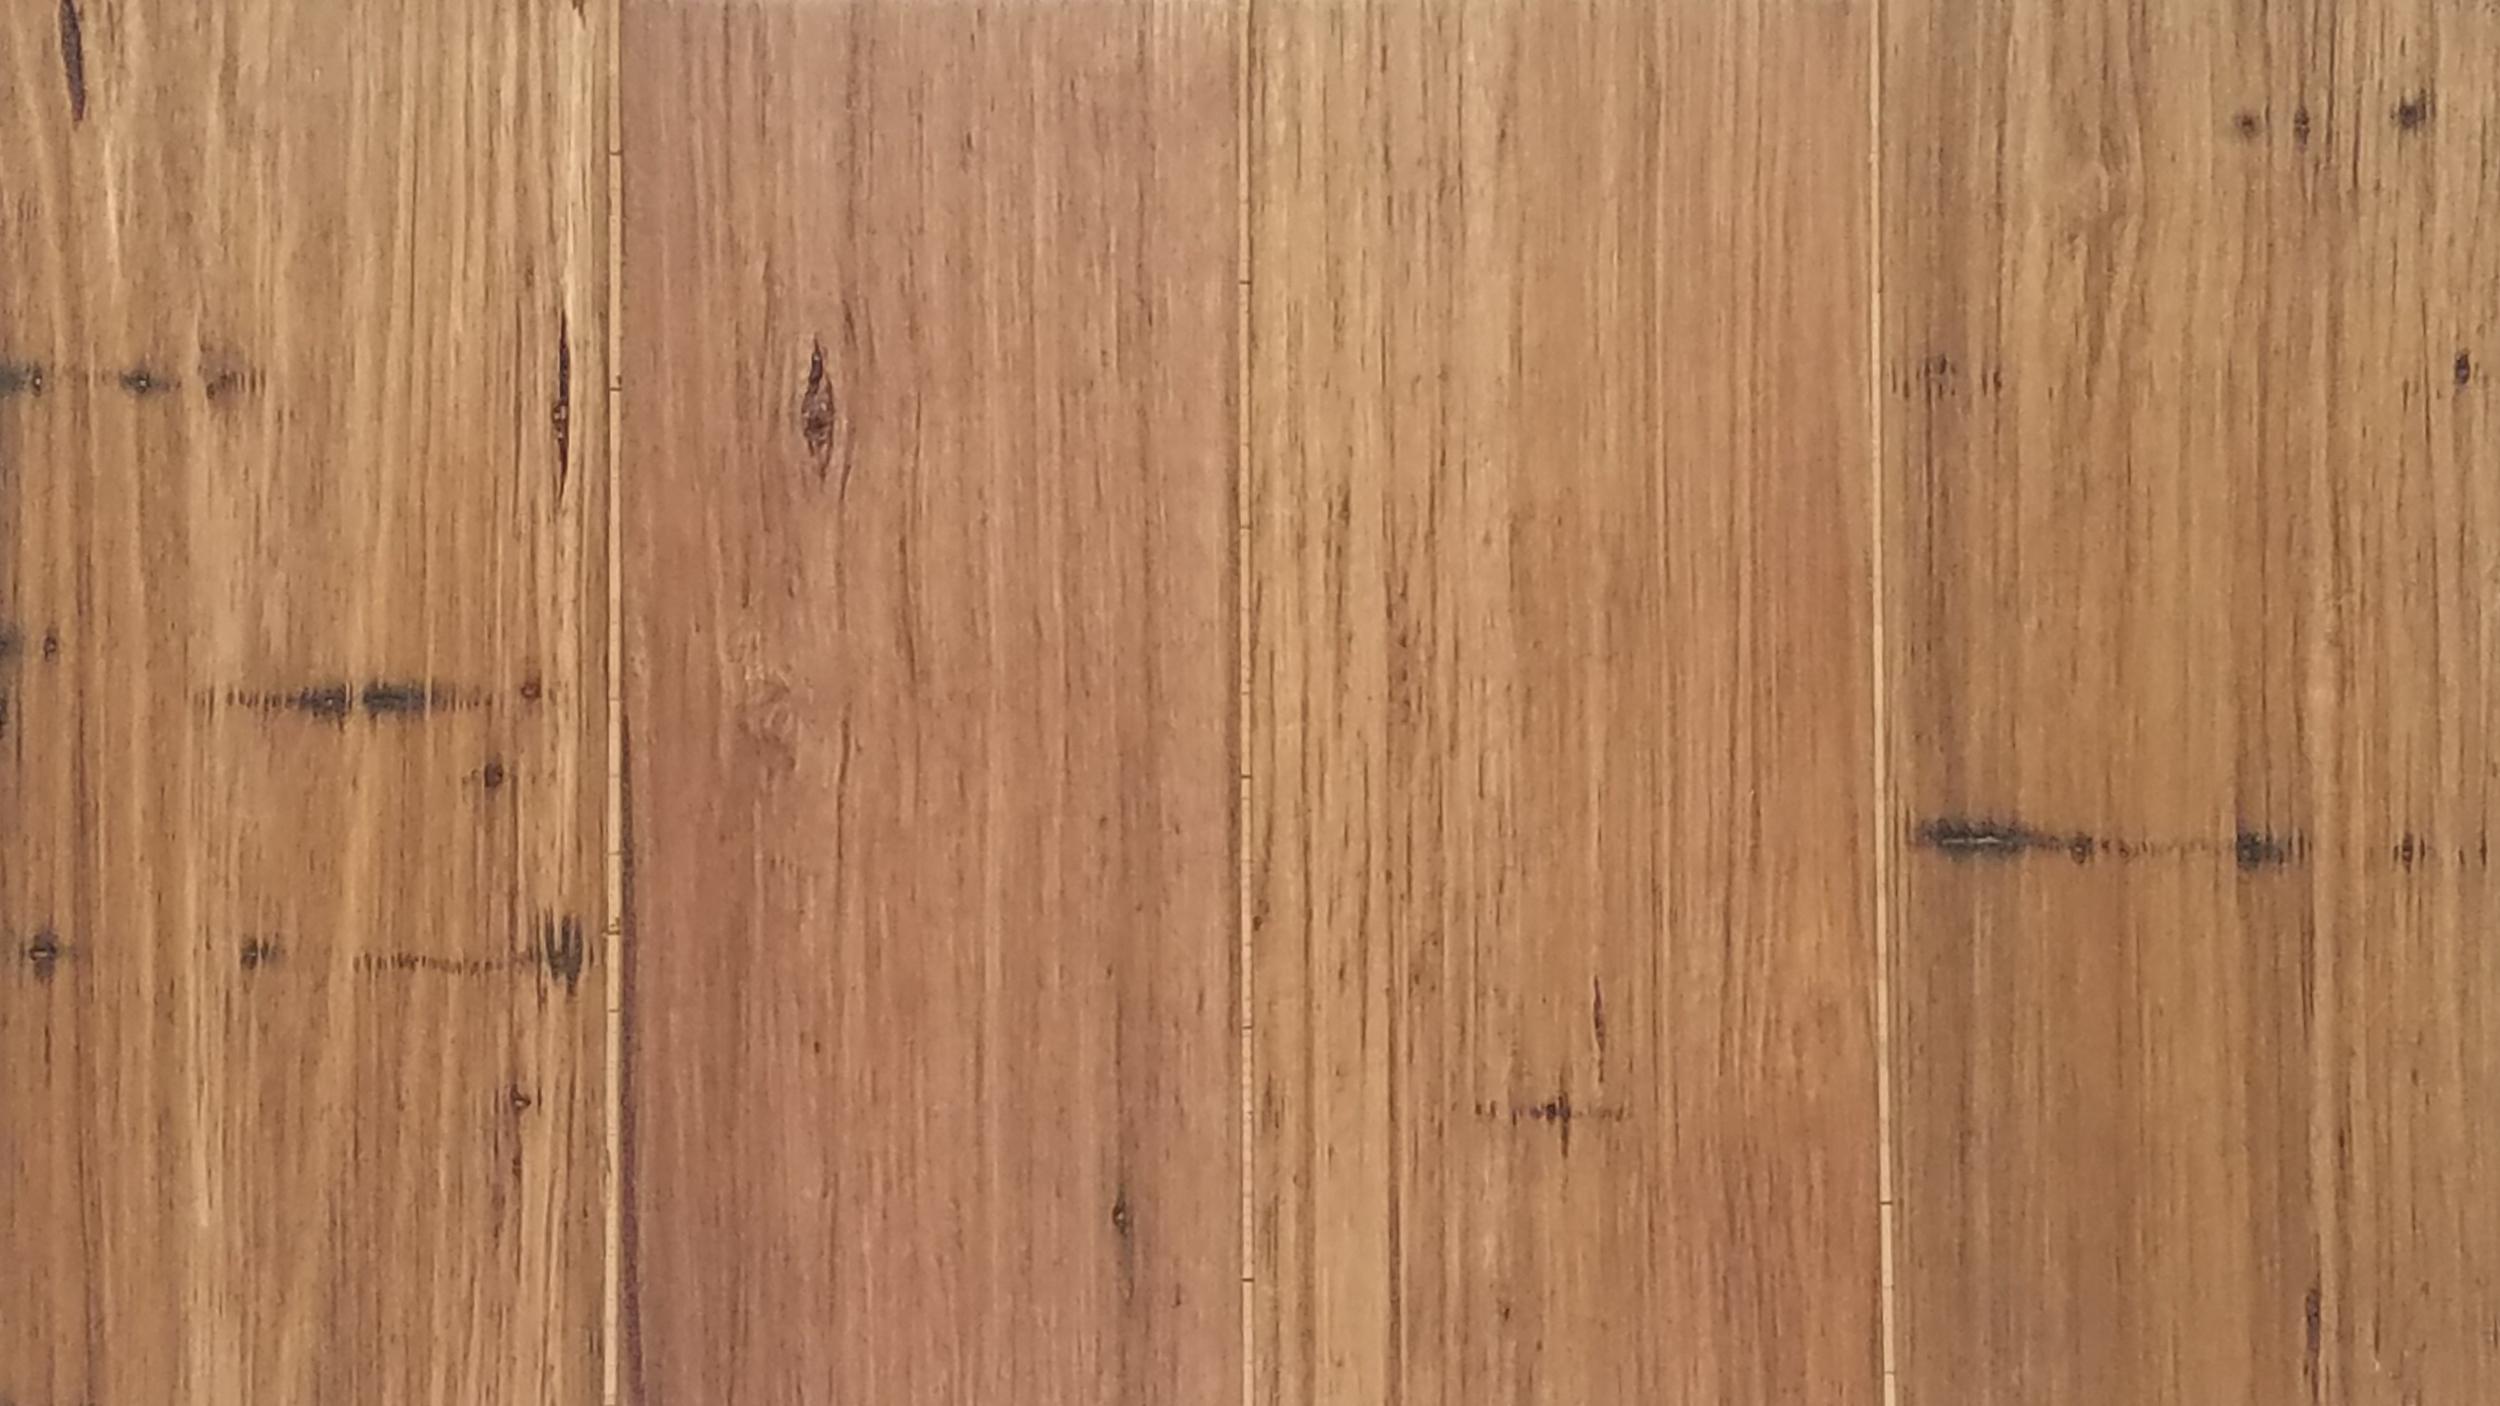 PN#8768 Australian Wormy Chestnut